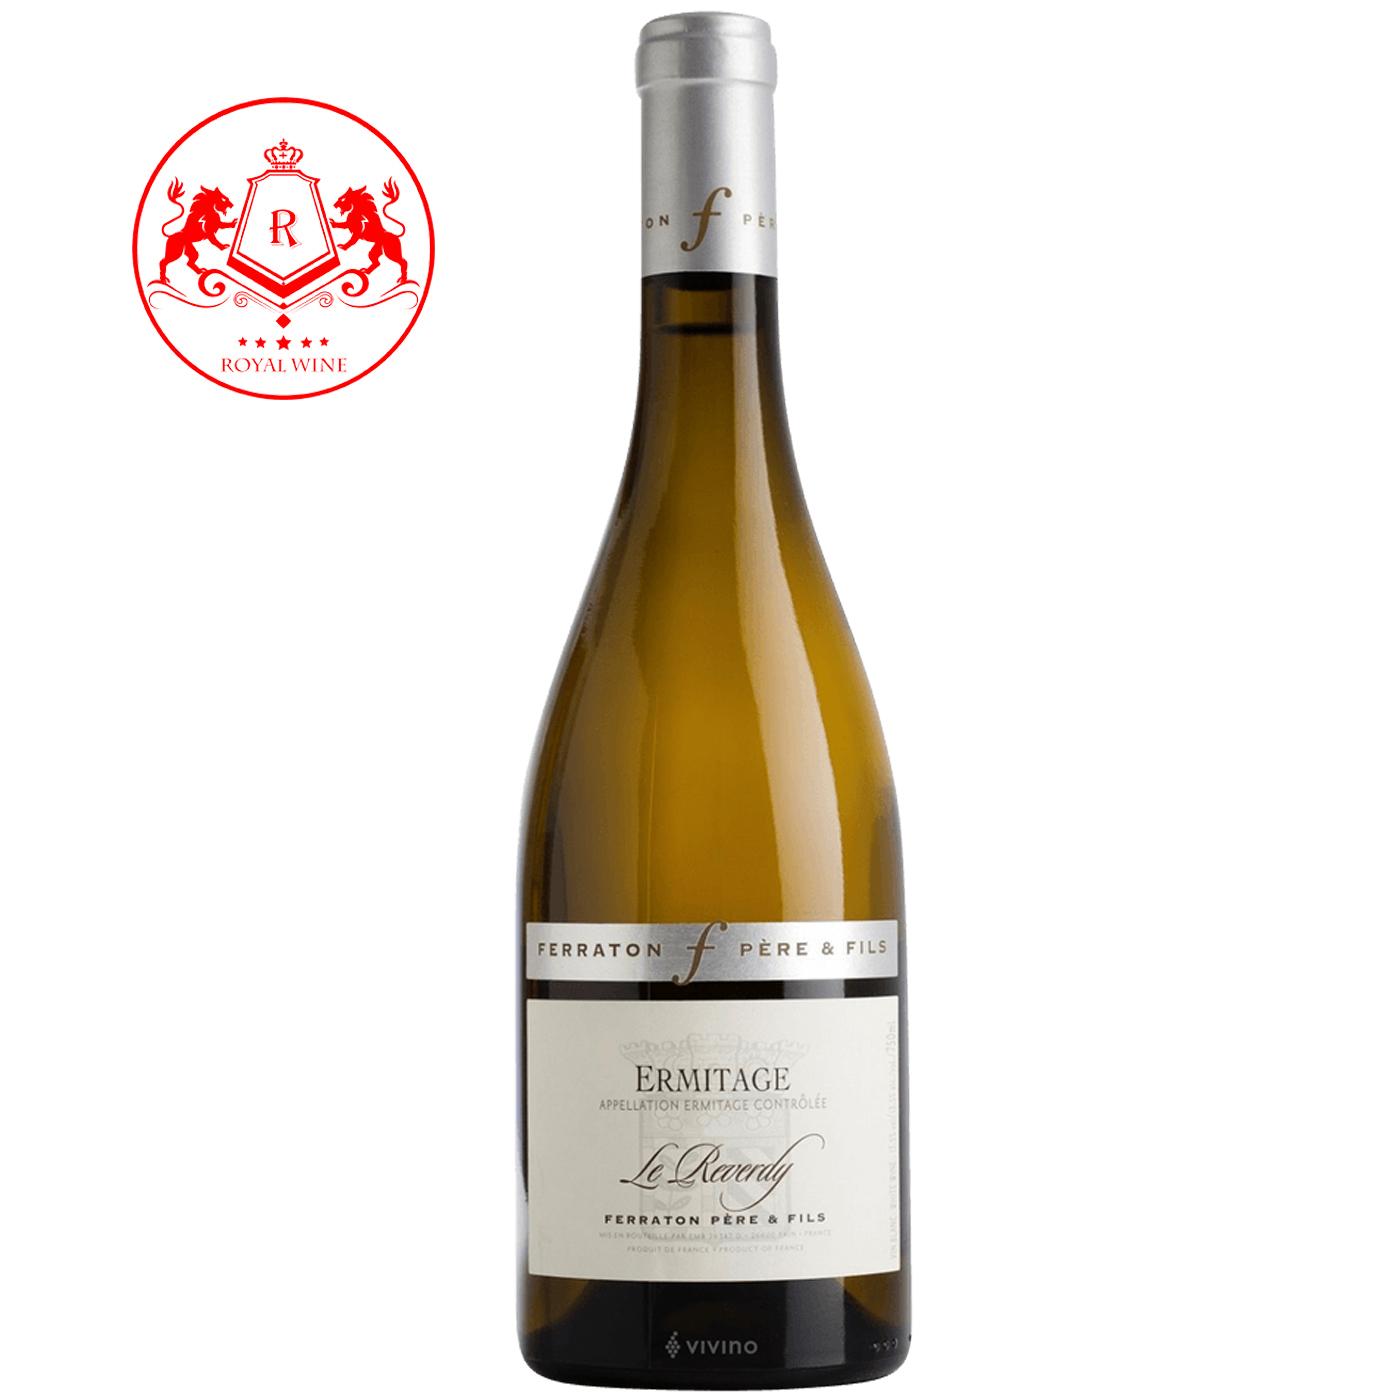 Rượu vang Ermitage LE REVERDY